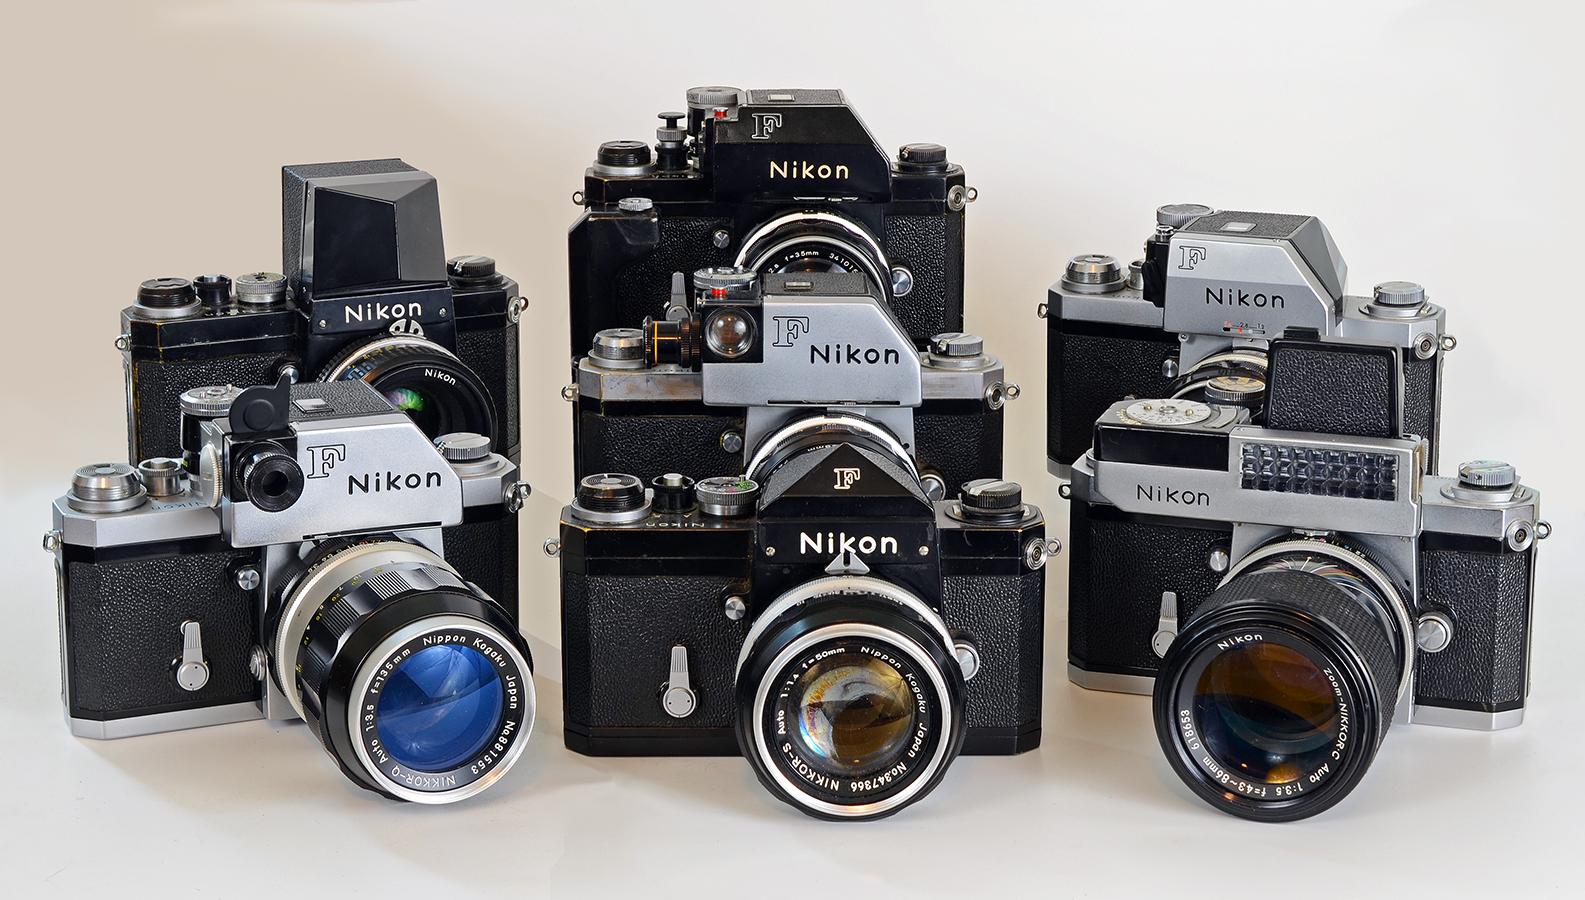 Nikon 7 F cameras 2-2-15 900px tall IIII.jpg